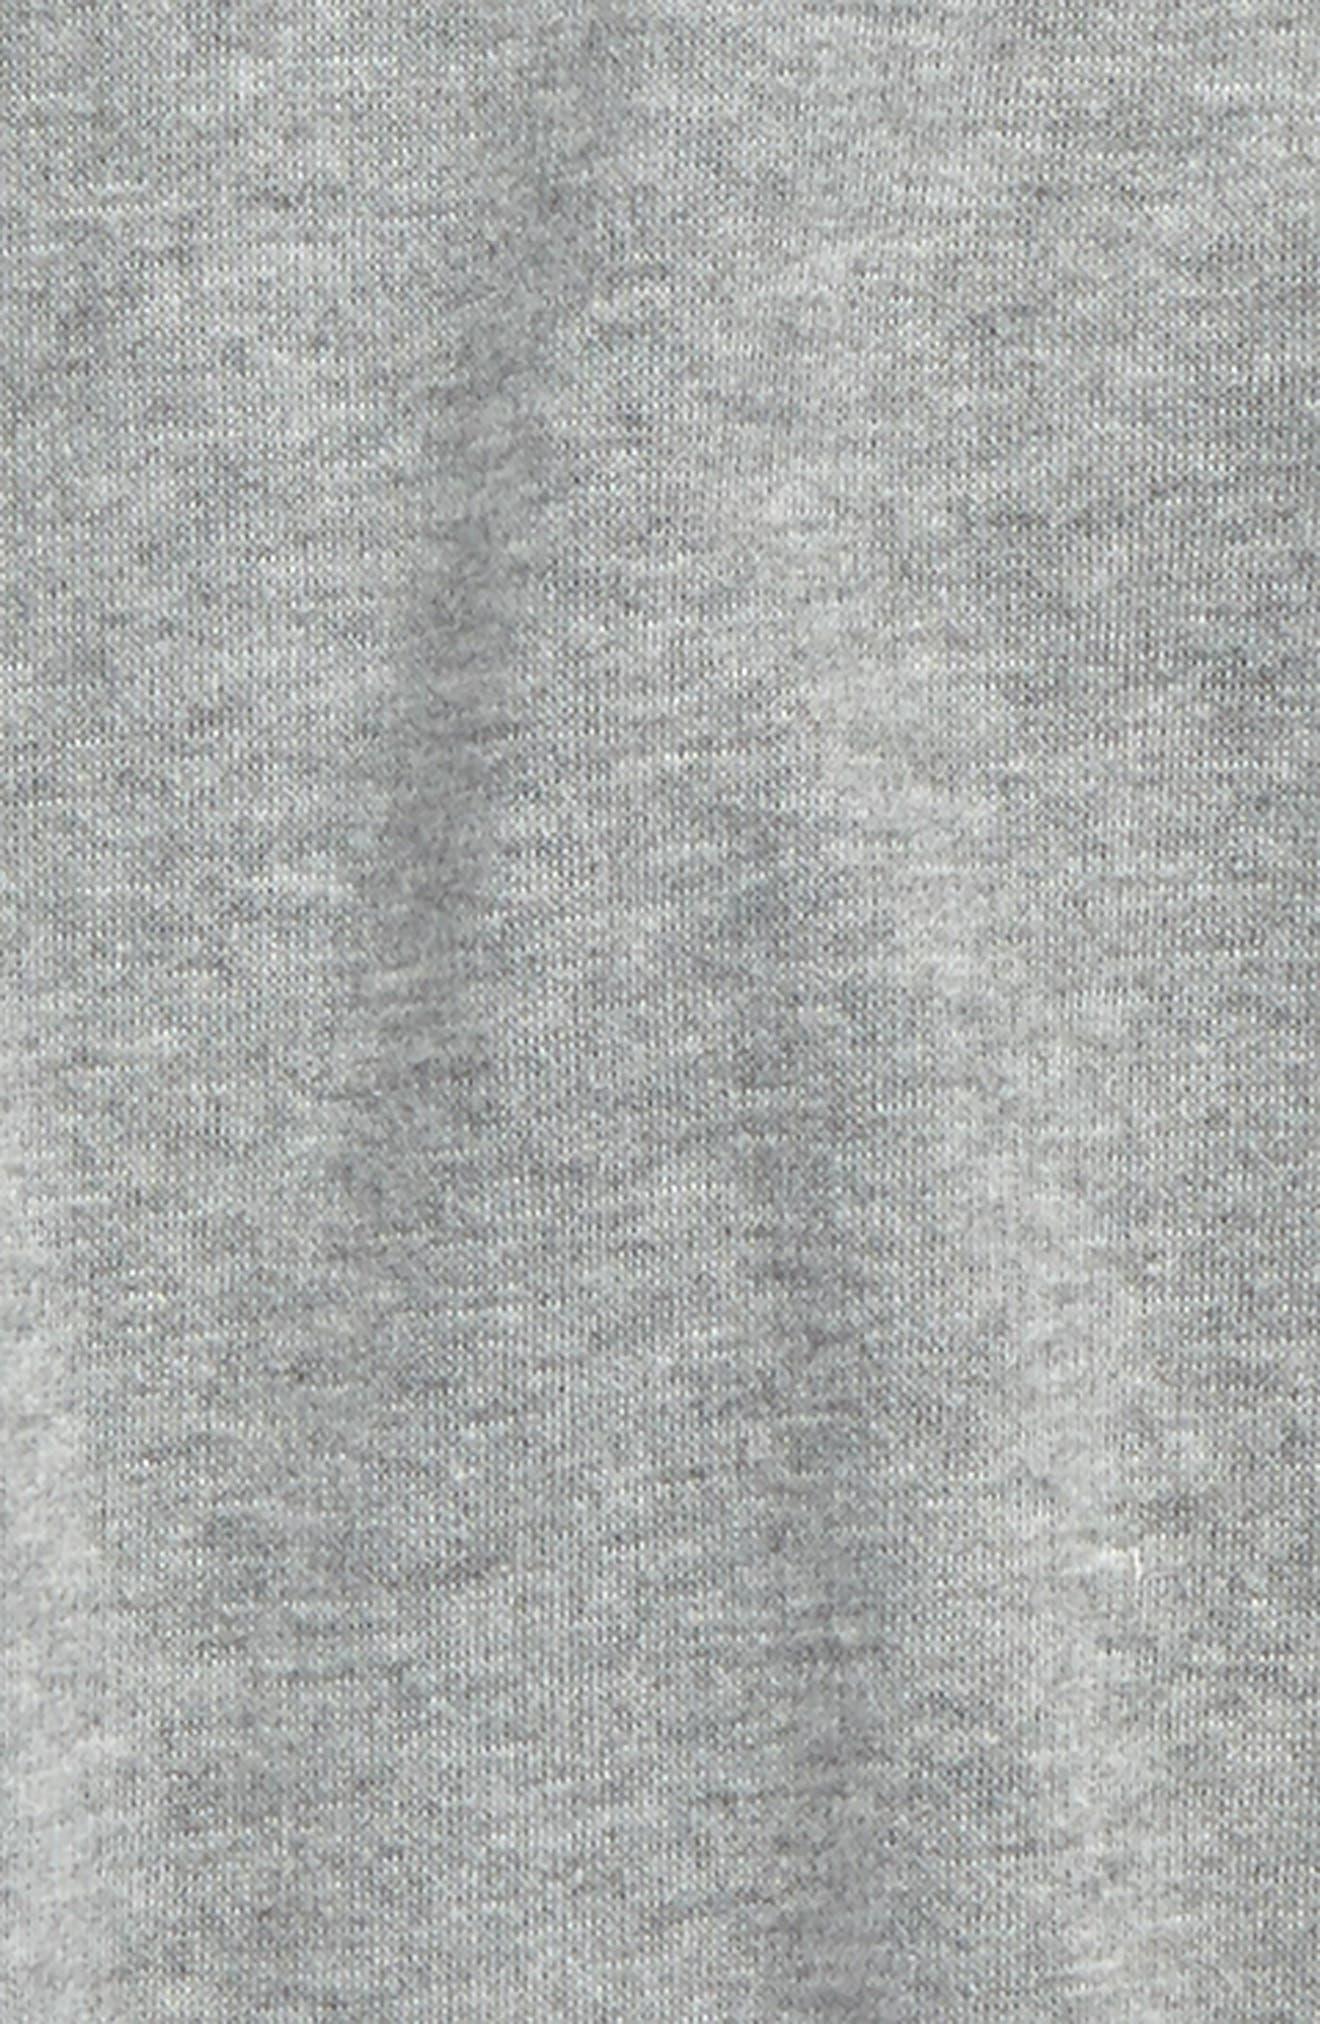 Ruffle Fleece Sweatshirt,                             Alternate thumbnail 2, color,                             030